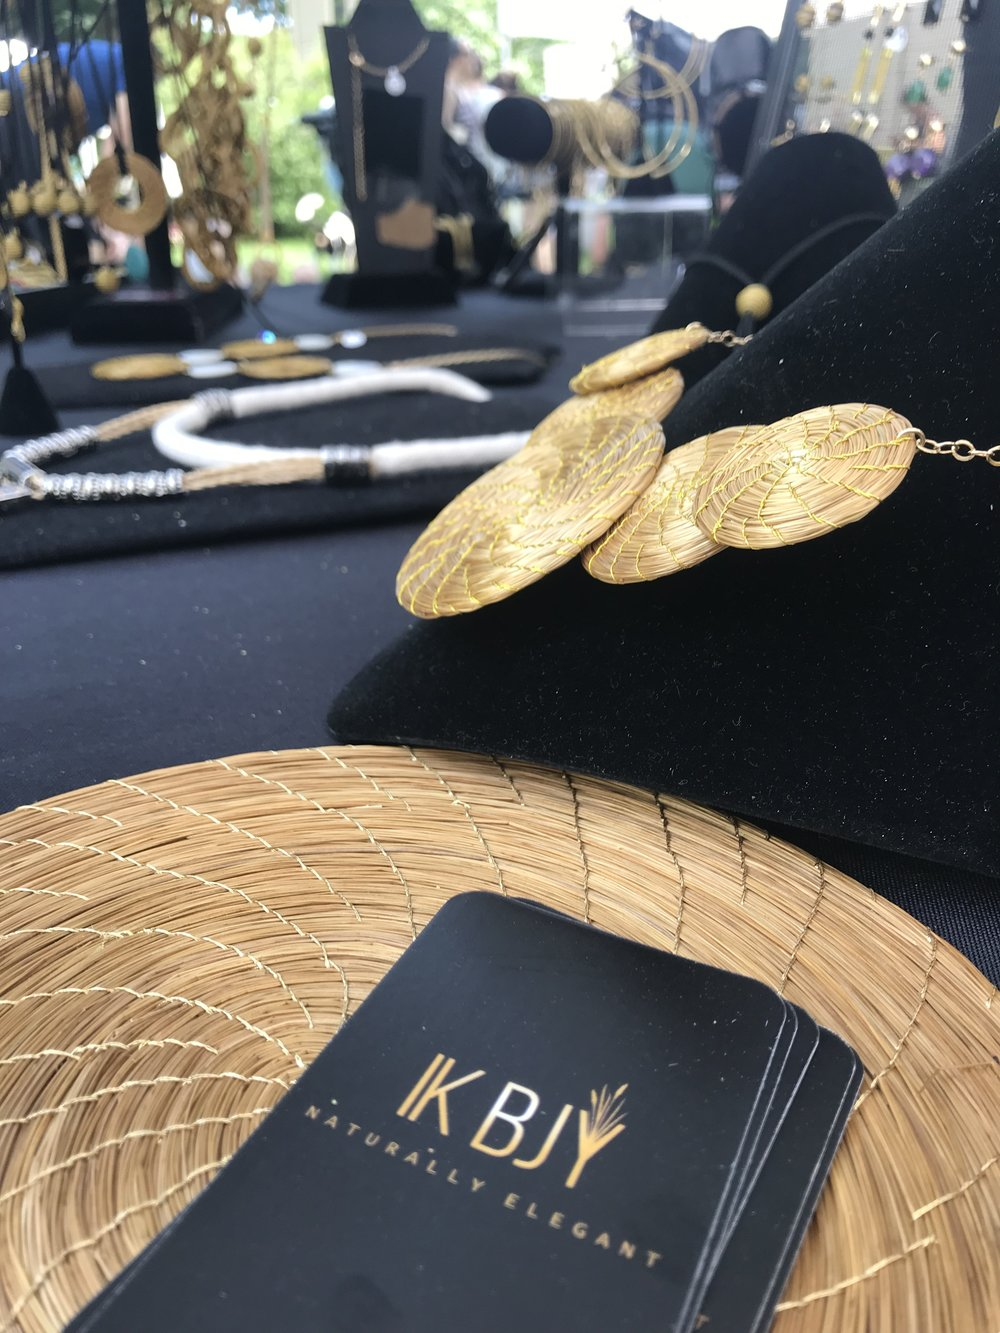 IKBJY Jewelry.JPG